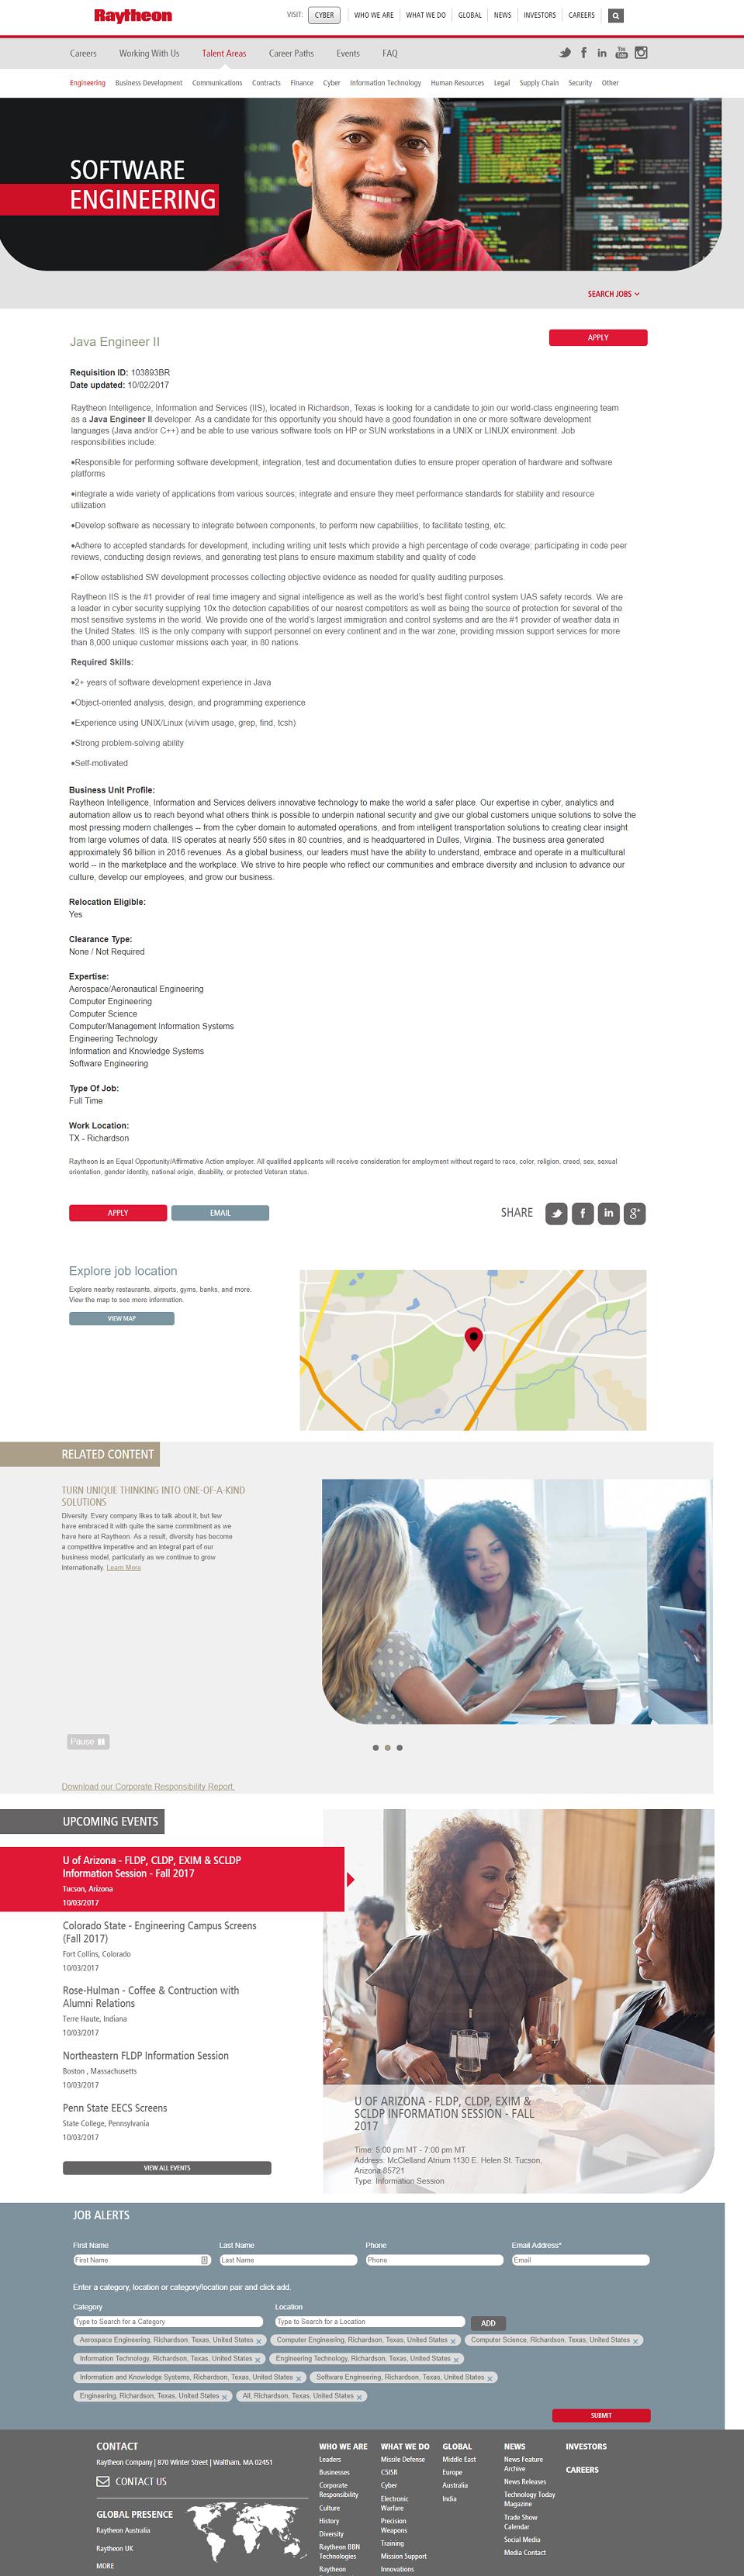 Raytheon Brassring ATS Job Page